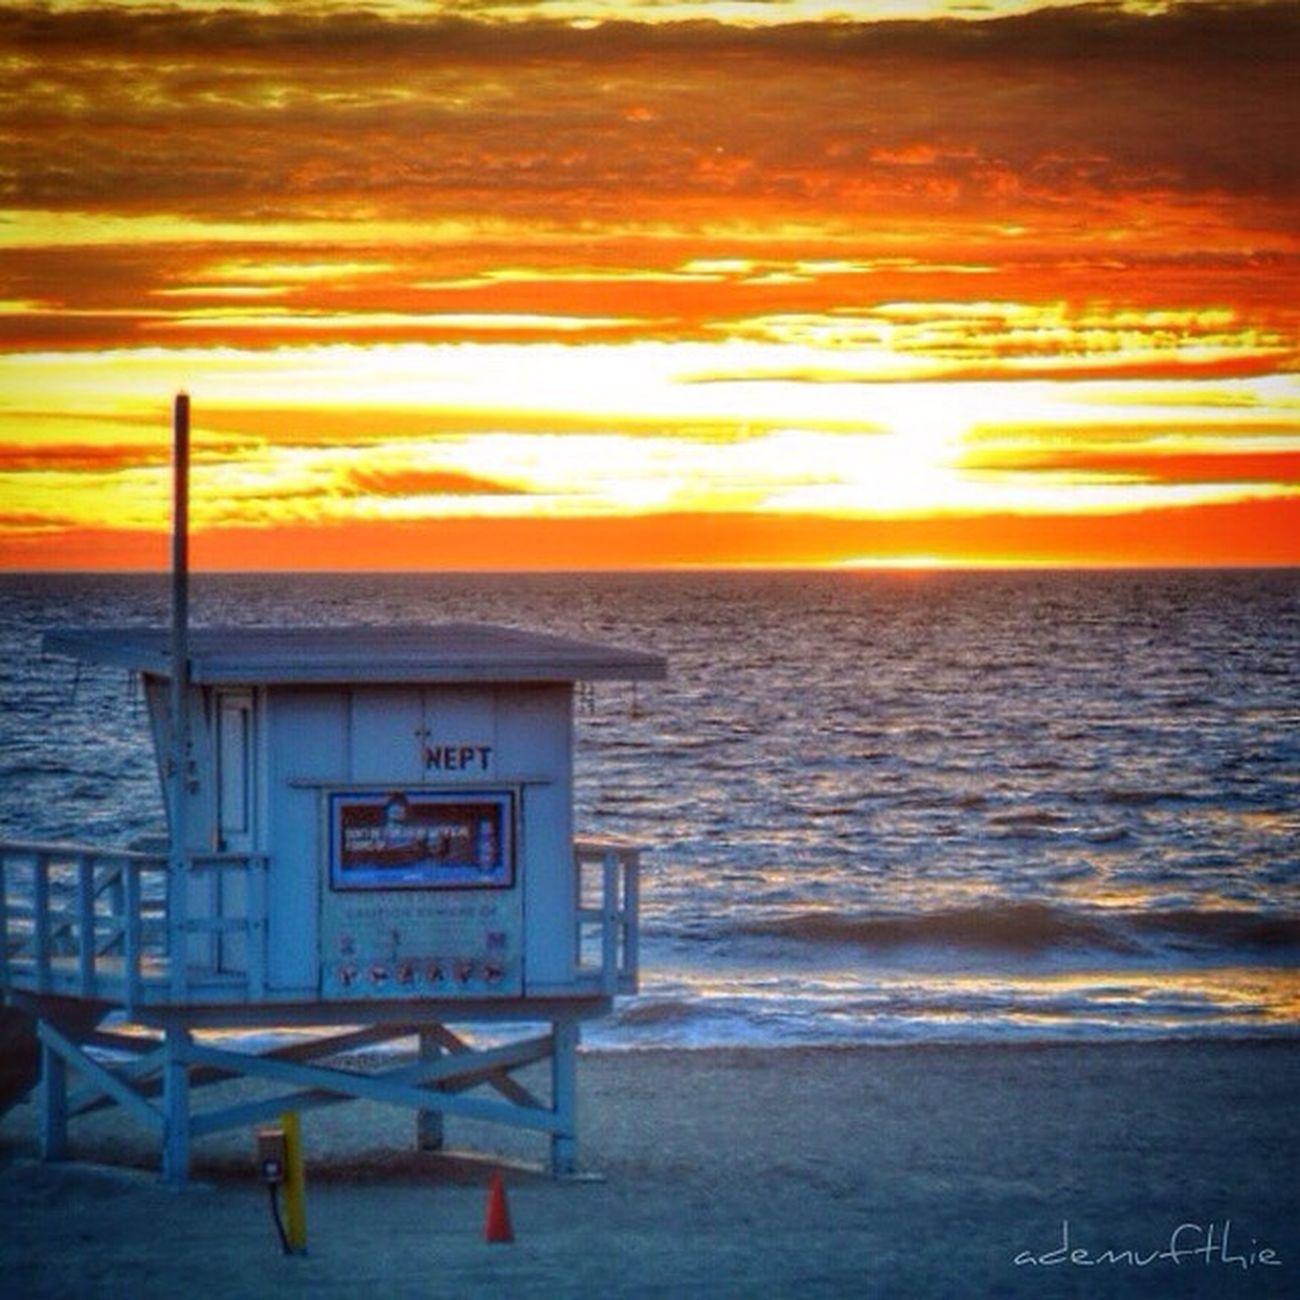 Manhattan Beach, CA EyeEmBestPics Life Is A Beach Skyporn Sunset #sun #clouds #skylovers #sky #nature #beautifulinnature #naturalbeauty #photography #landscape Beautiful Nikon Beach Traveling Losangeles